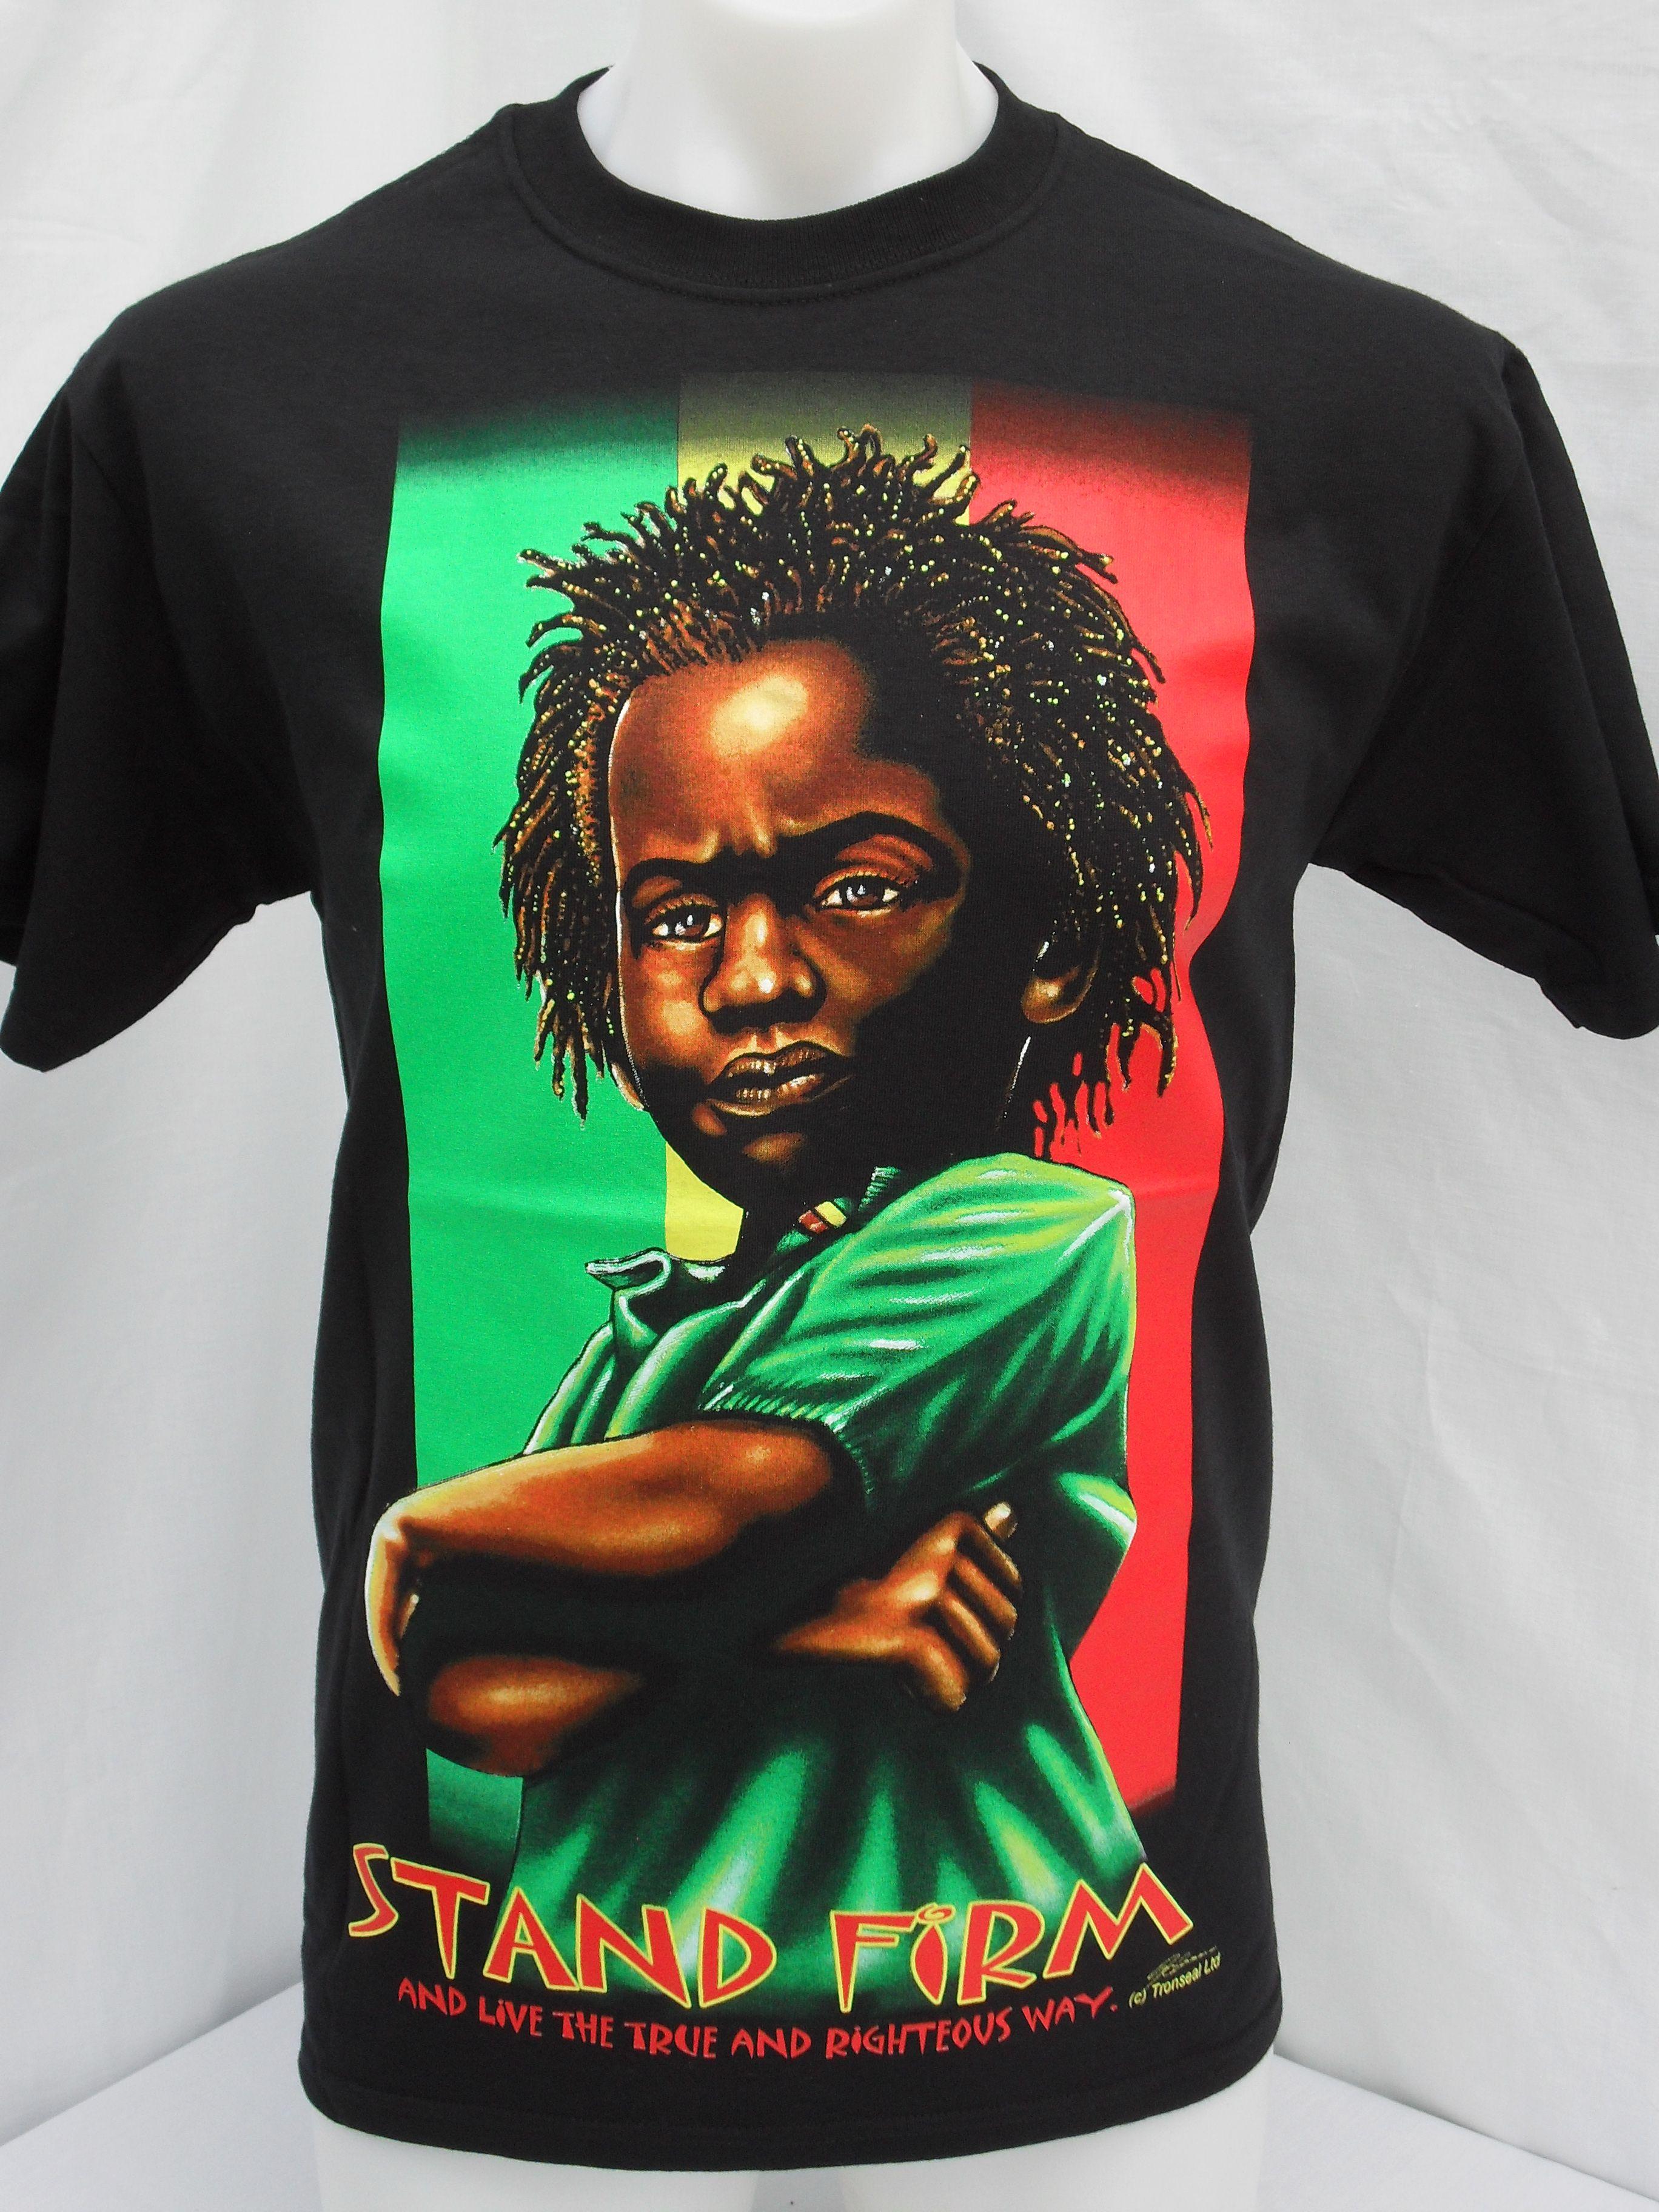 c380d6ed76 Stand Firm T-Shirt | Rasta T-Shirts | Rasta t shirts, T shirt, Shirts